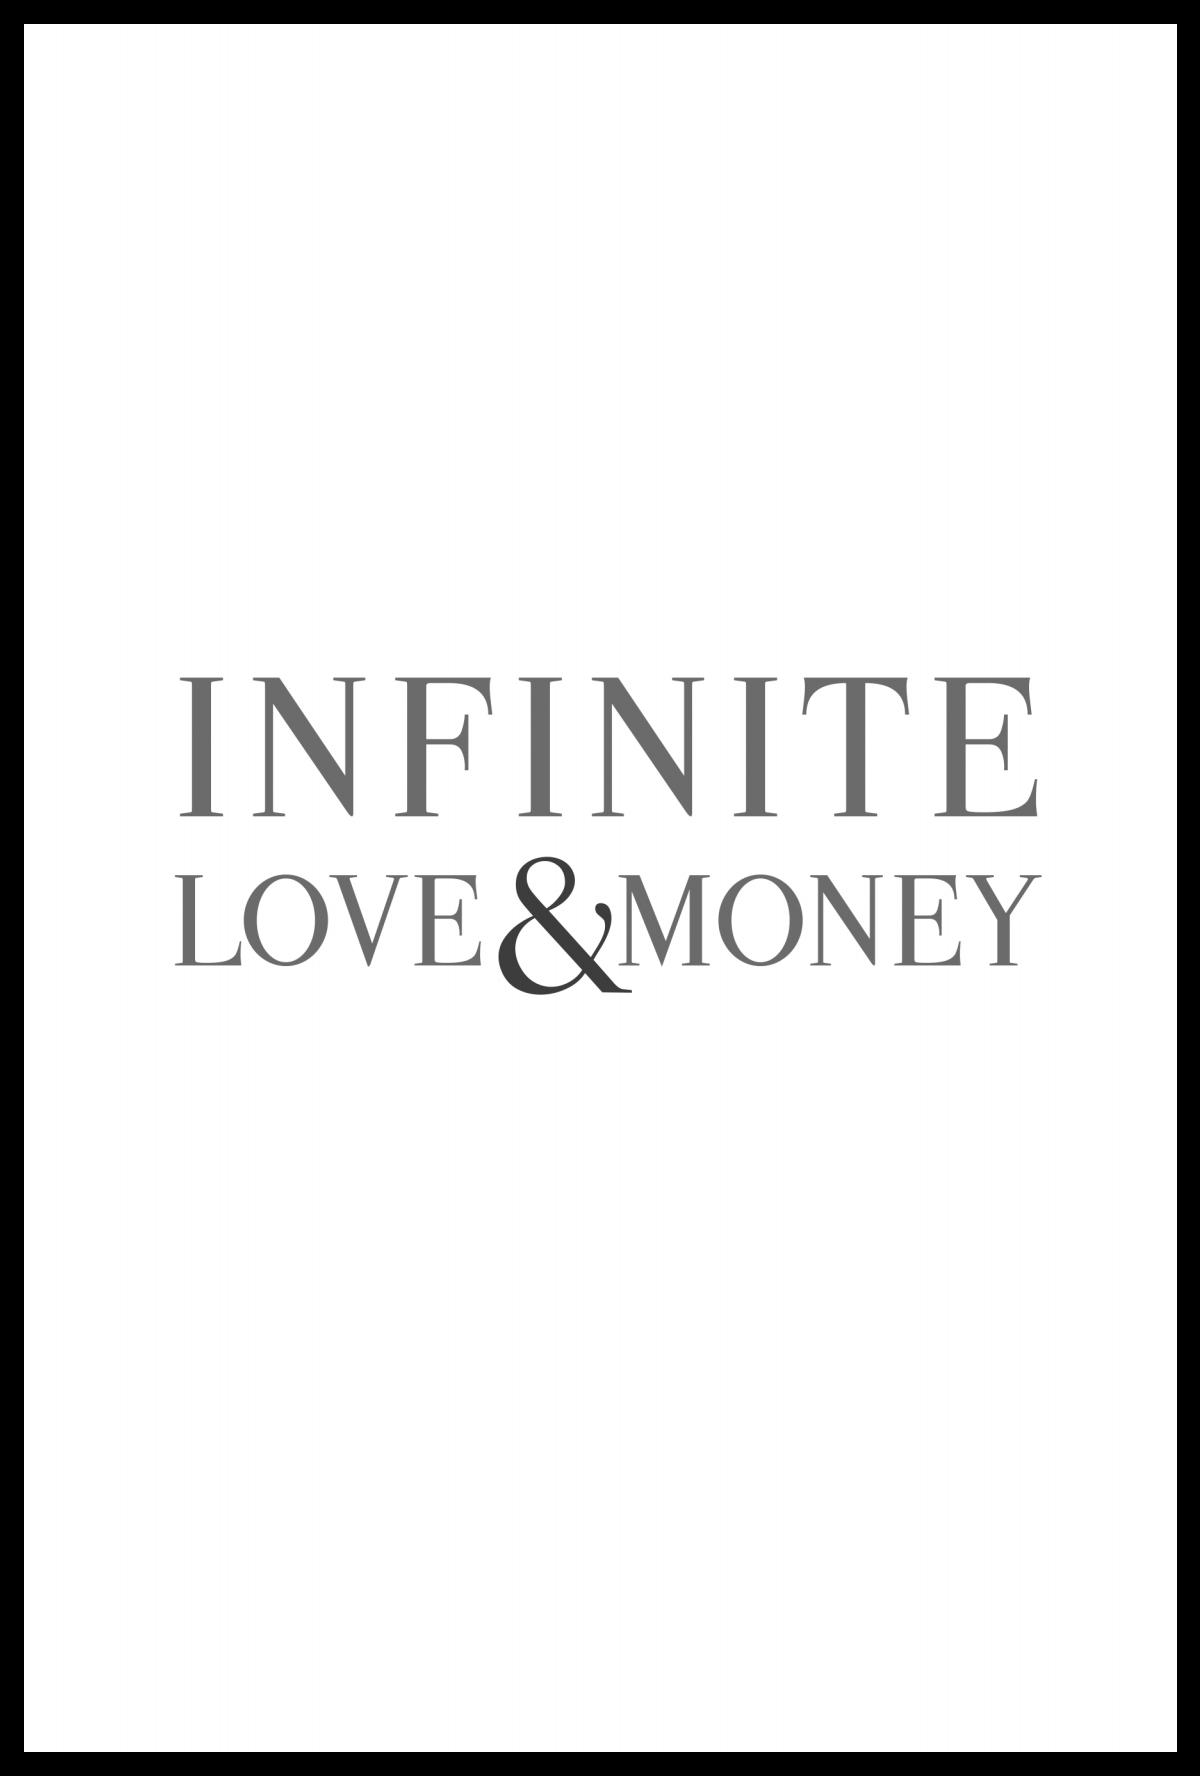 Infinite Love and Money - Cover & Typesetting